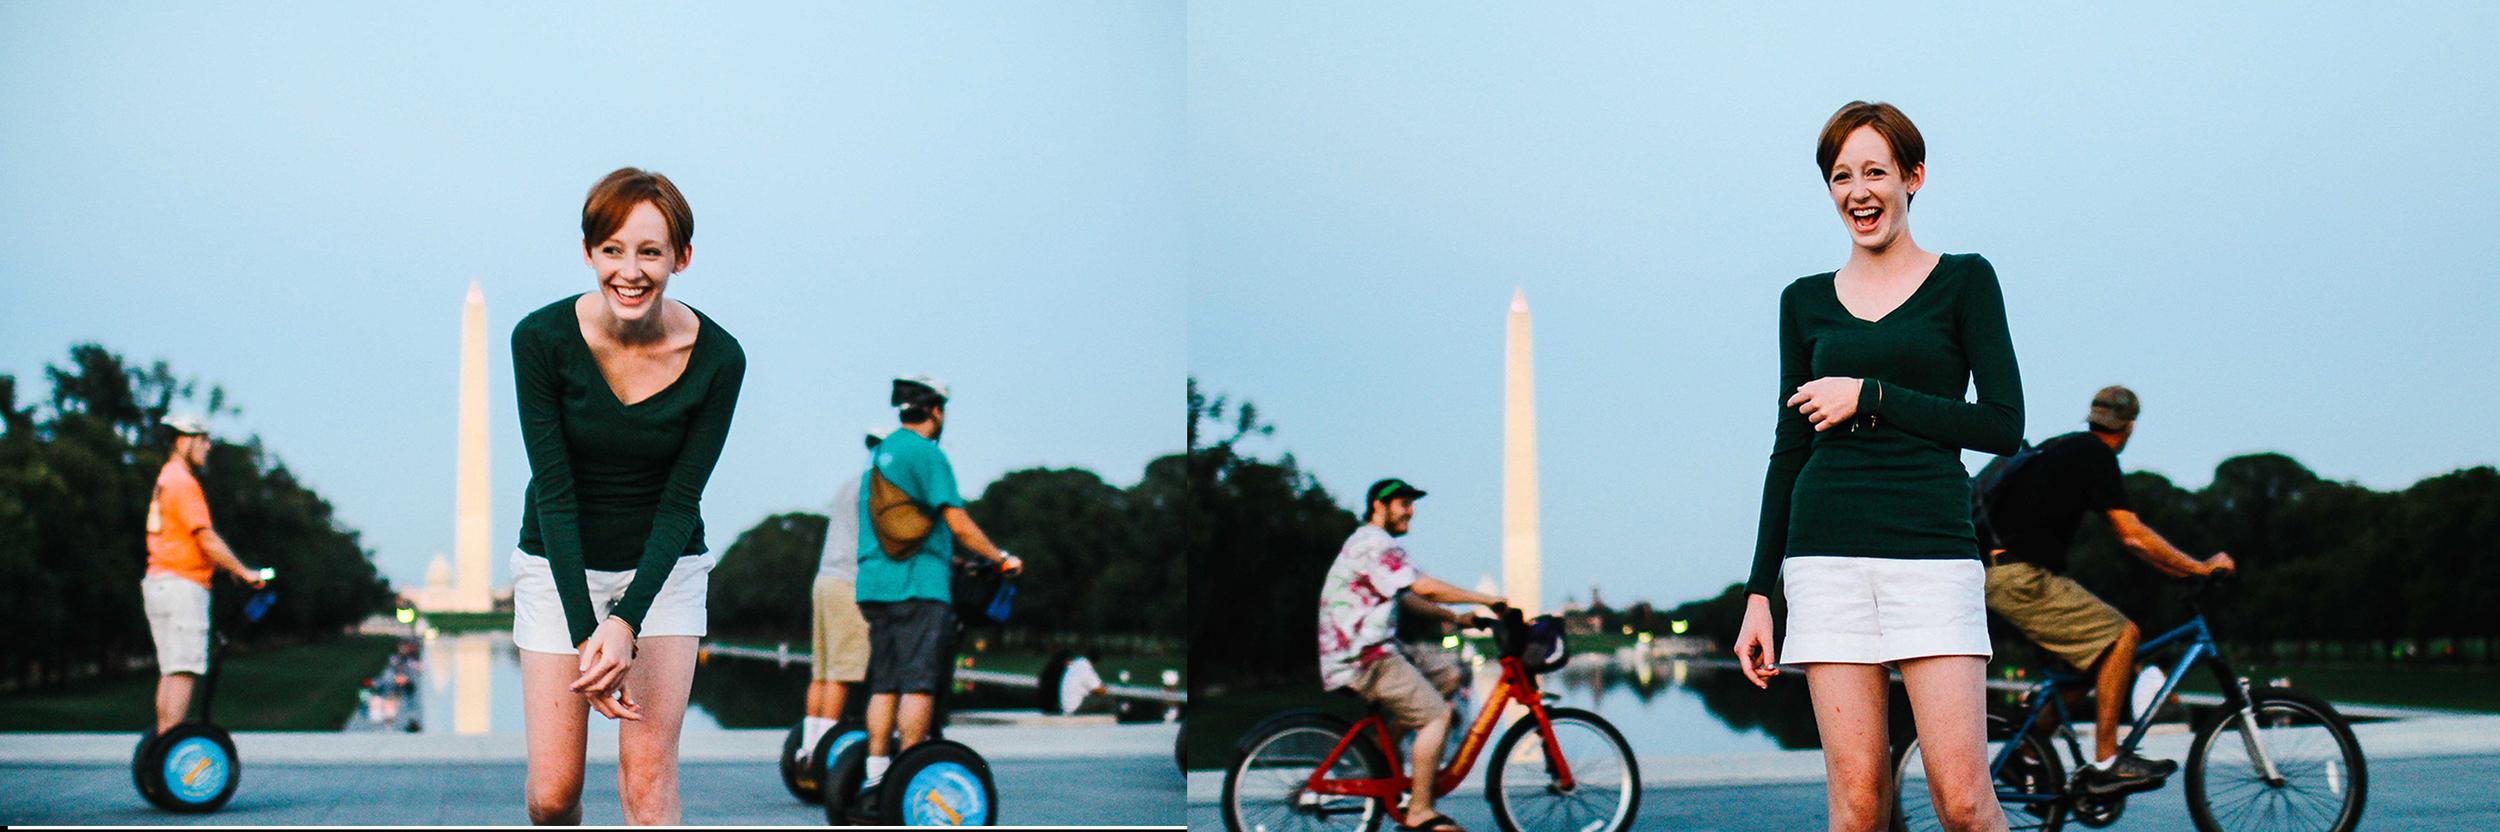 overrun by bikes in washington DC.jpg